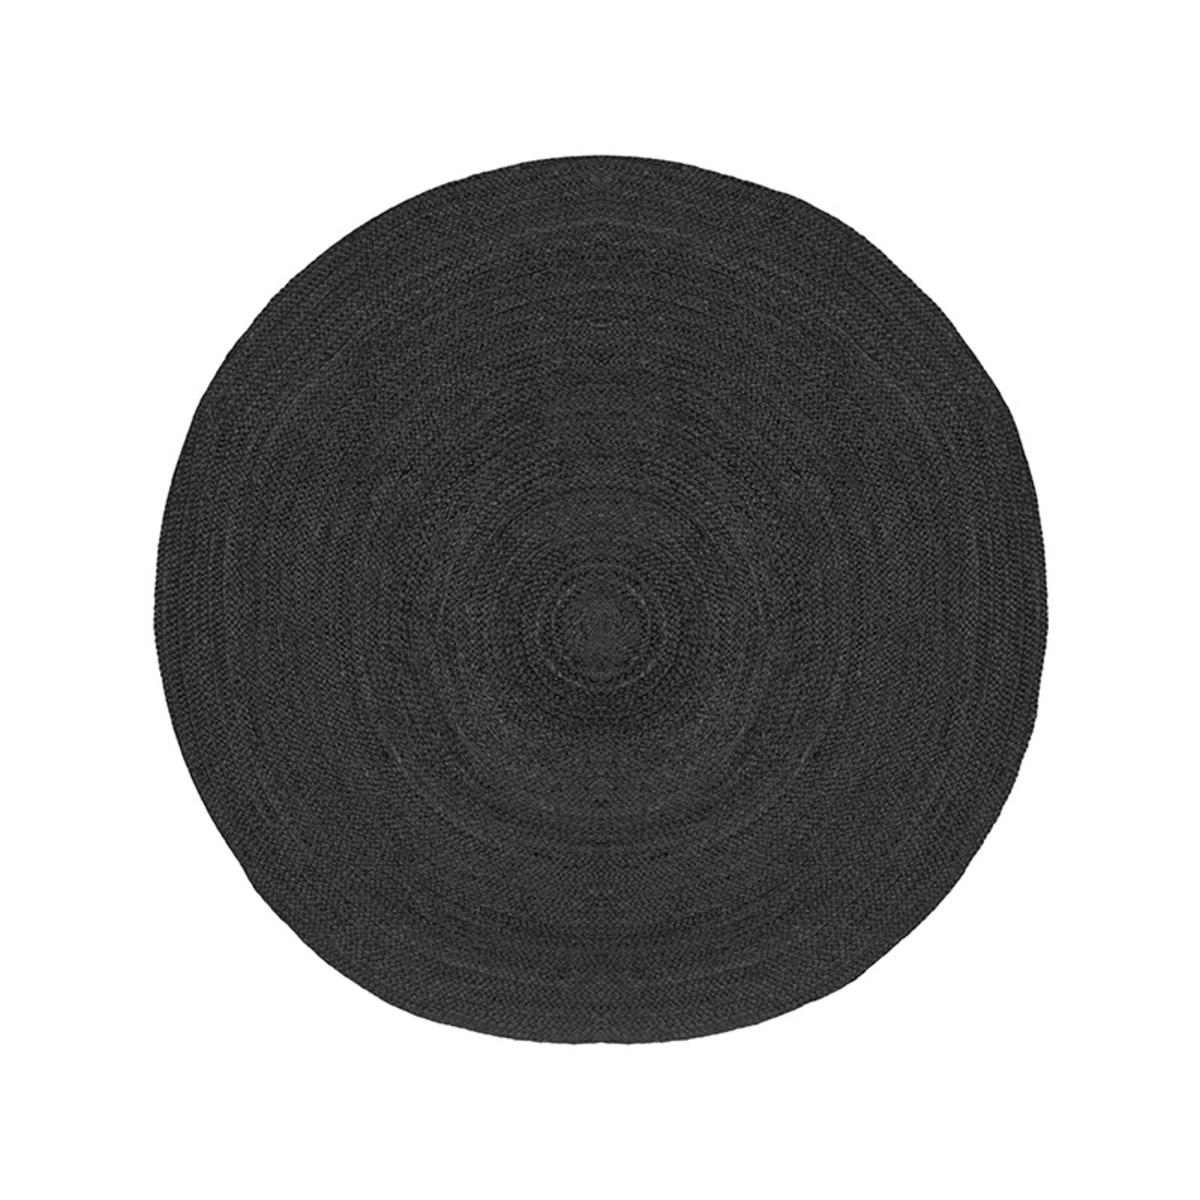 Vloerkleed Jute - Zwart - Jute - 150